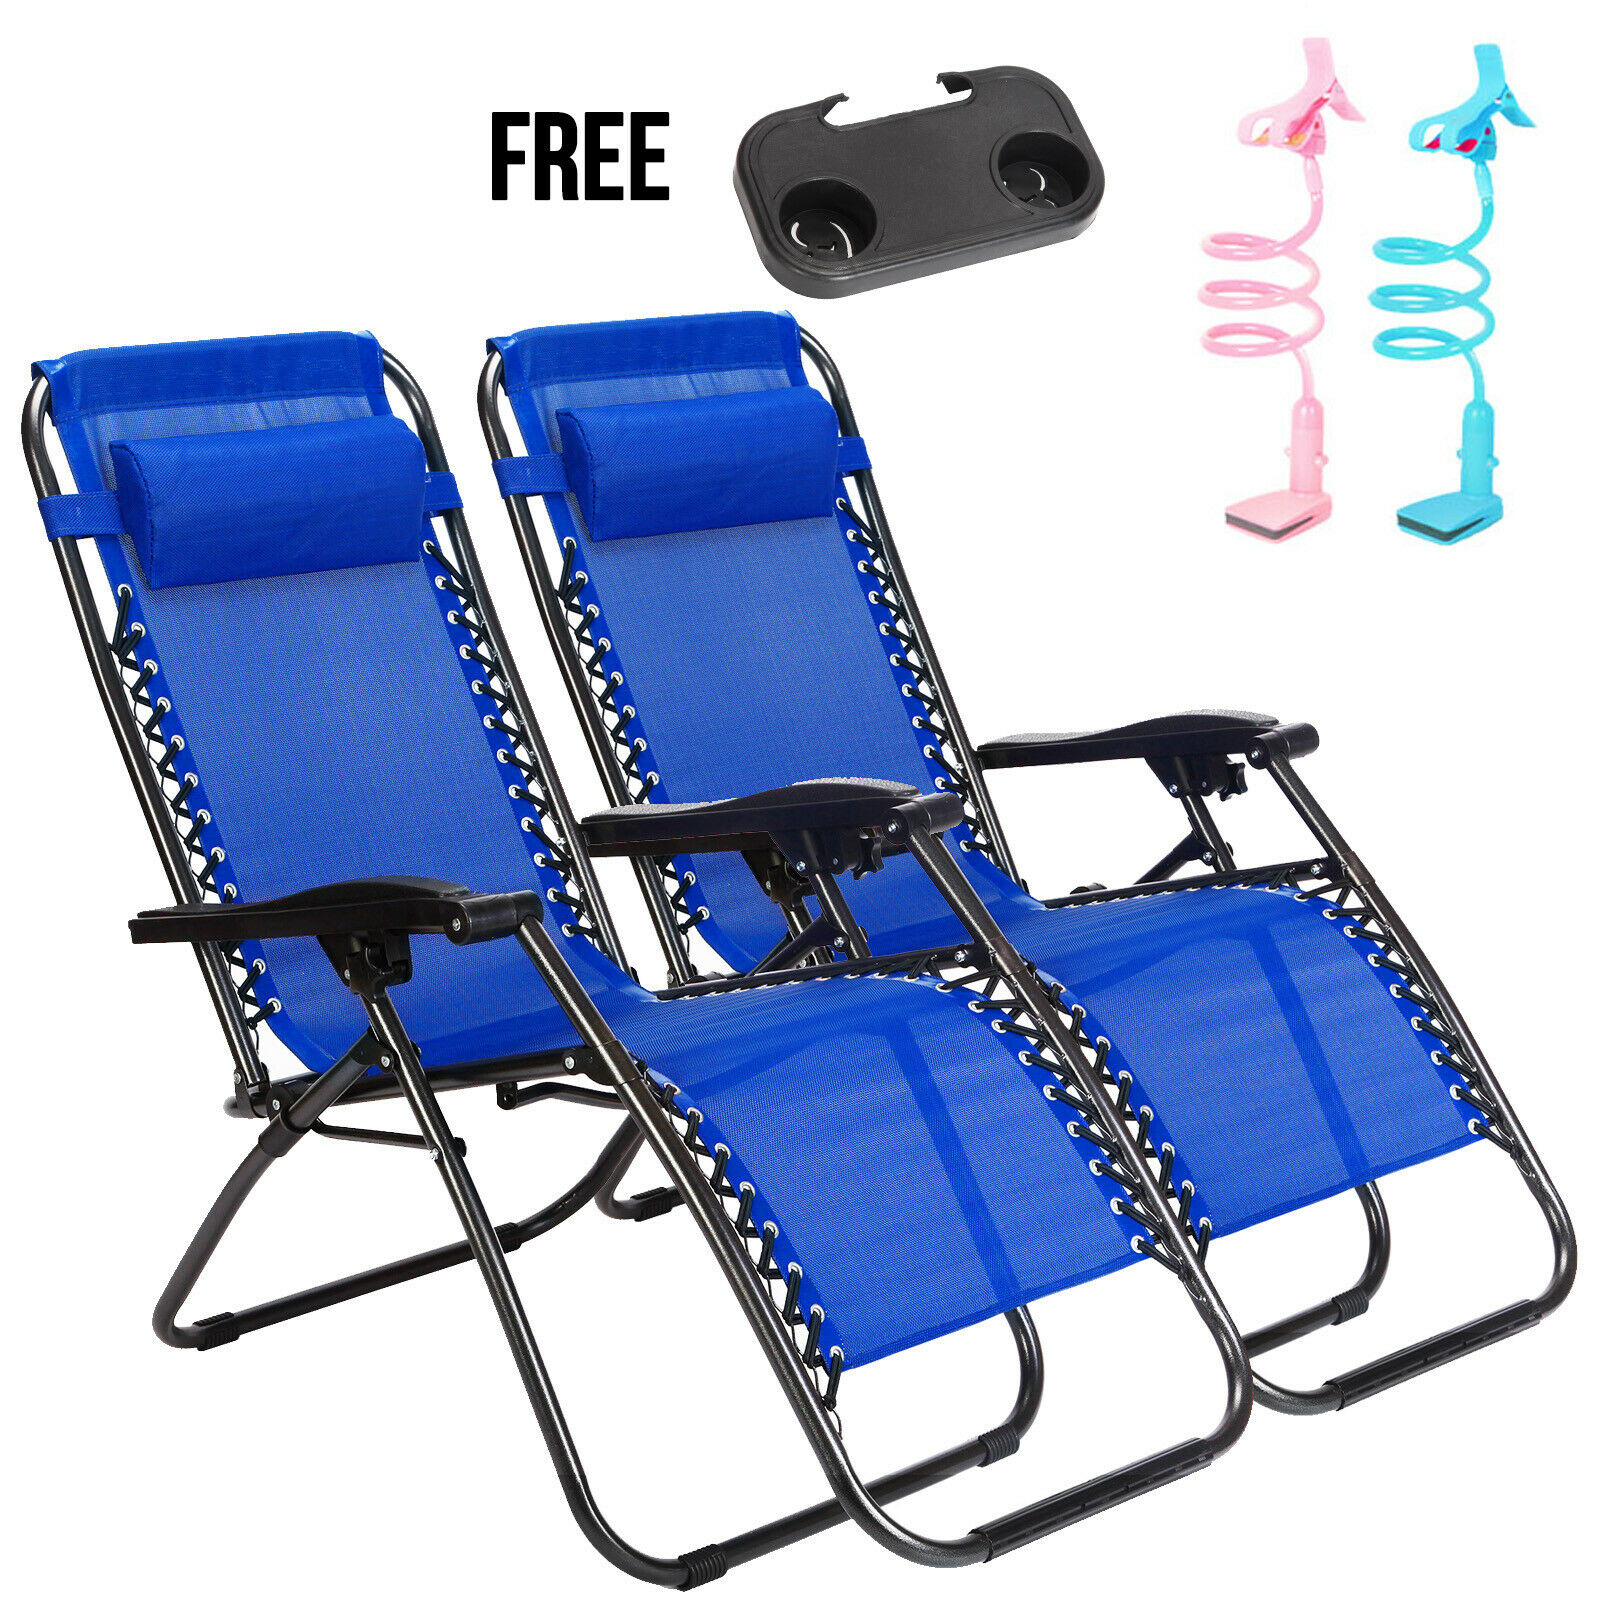 2 Zero Gravity Reclining Chairs Sun Beach Camping Folding Lounge W Phone Holders